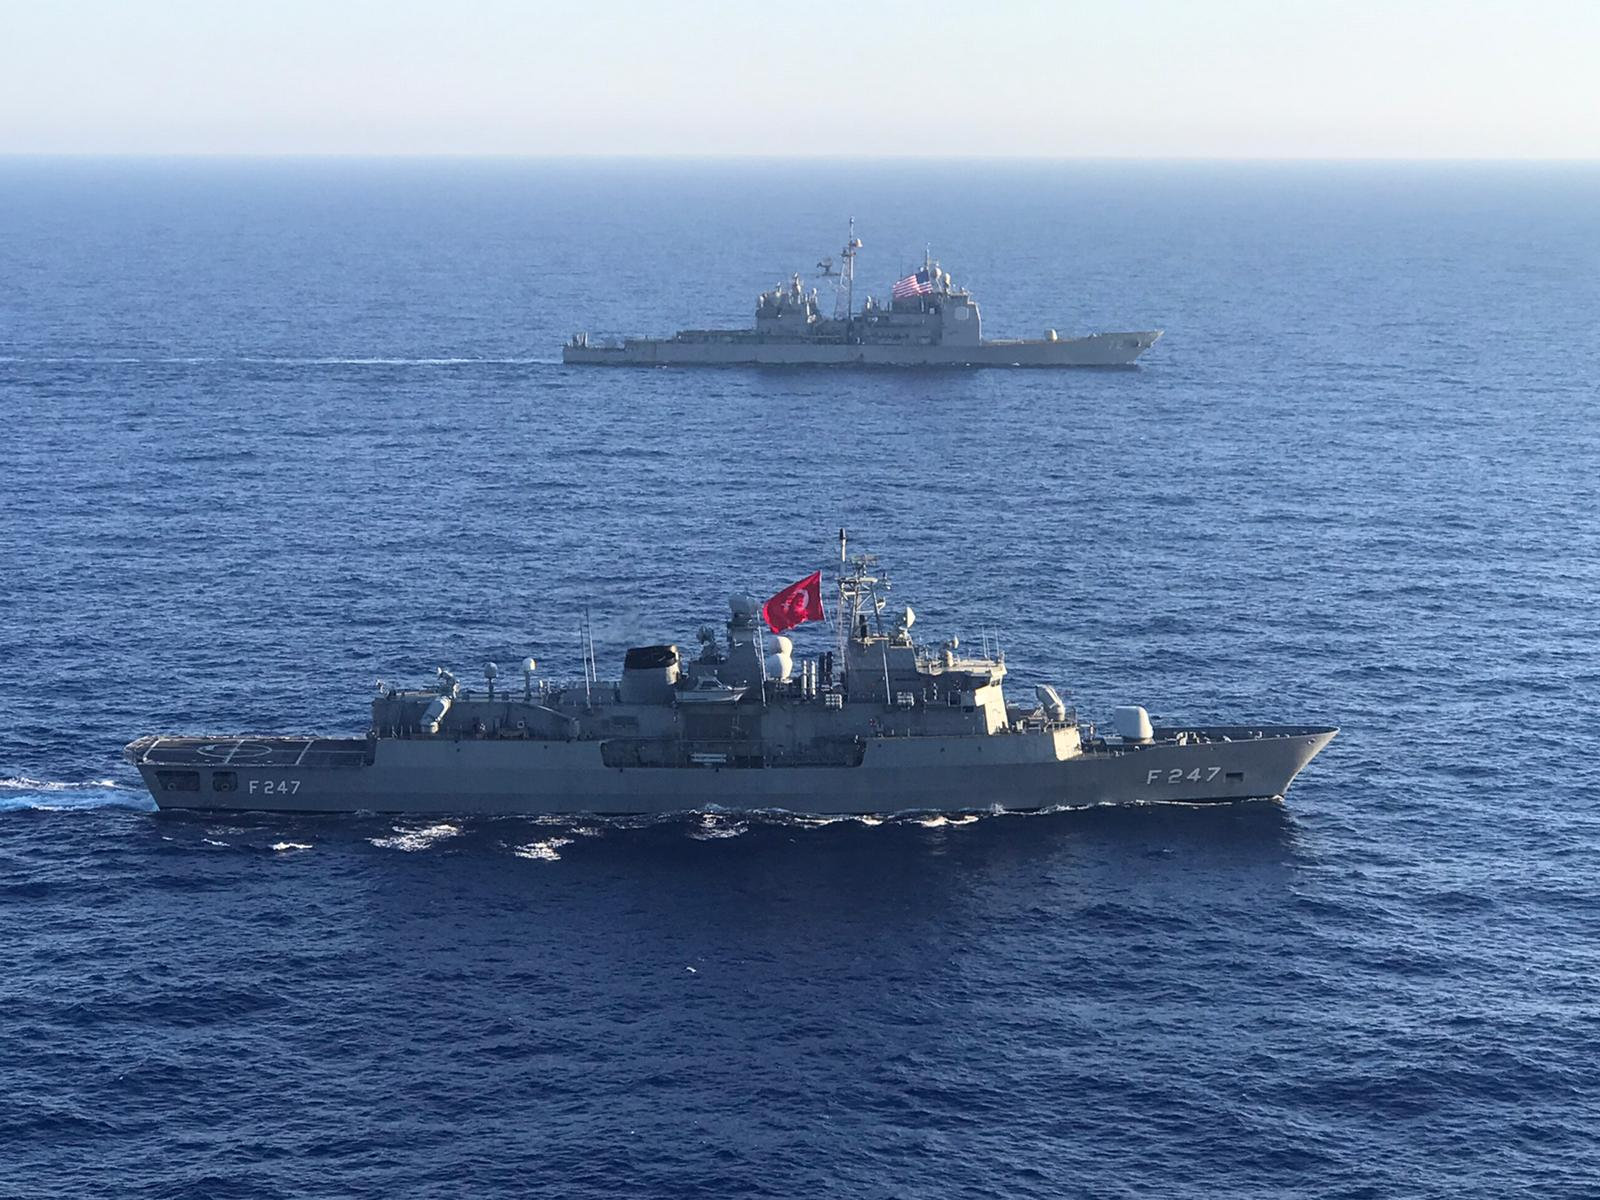 O Erdogan παίζει ξανά με τη φωτιά – Τα σενάρια για έναρξη τουρκικών ερευνών στη Μεσόγειο και τα μυστικά της συμφωνίας Ελλάδας – Αιγύπτου